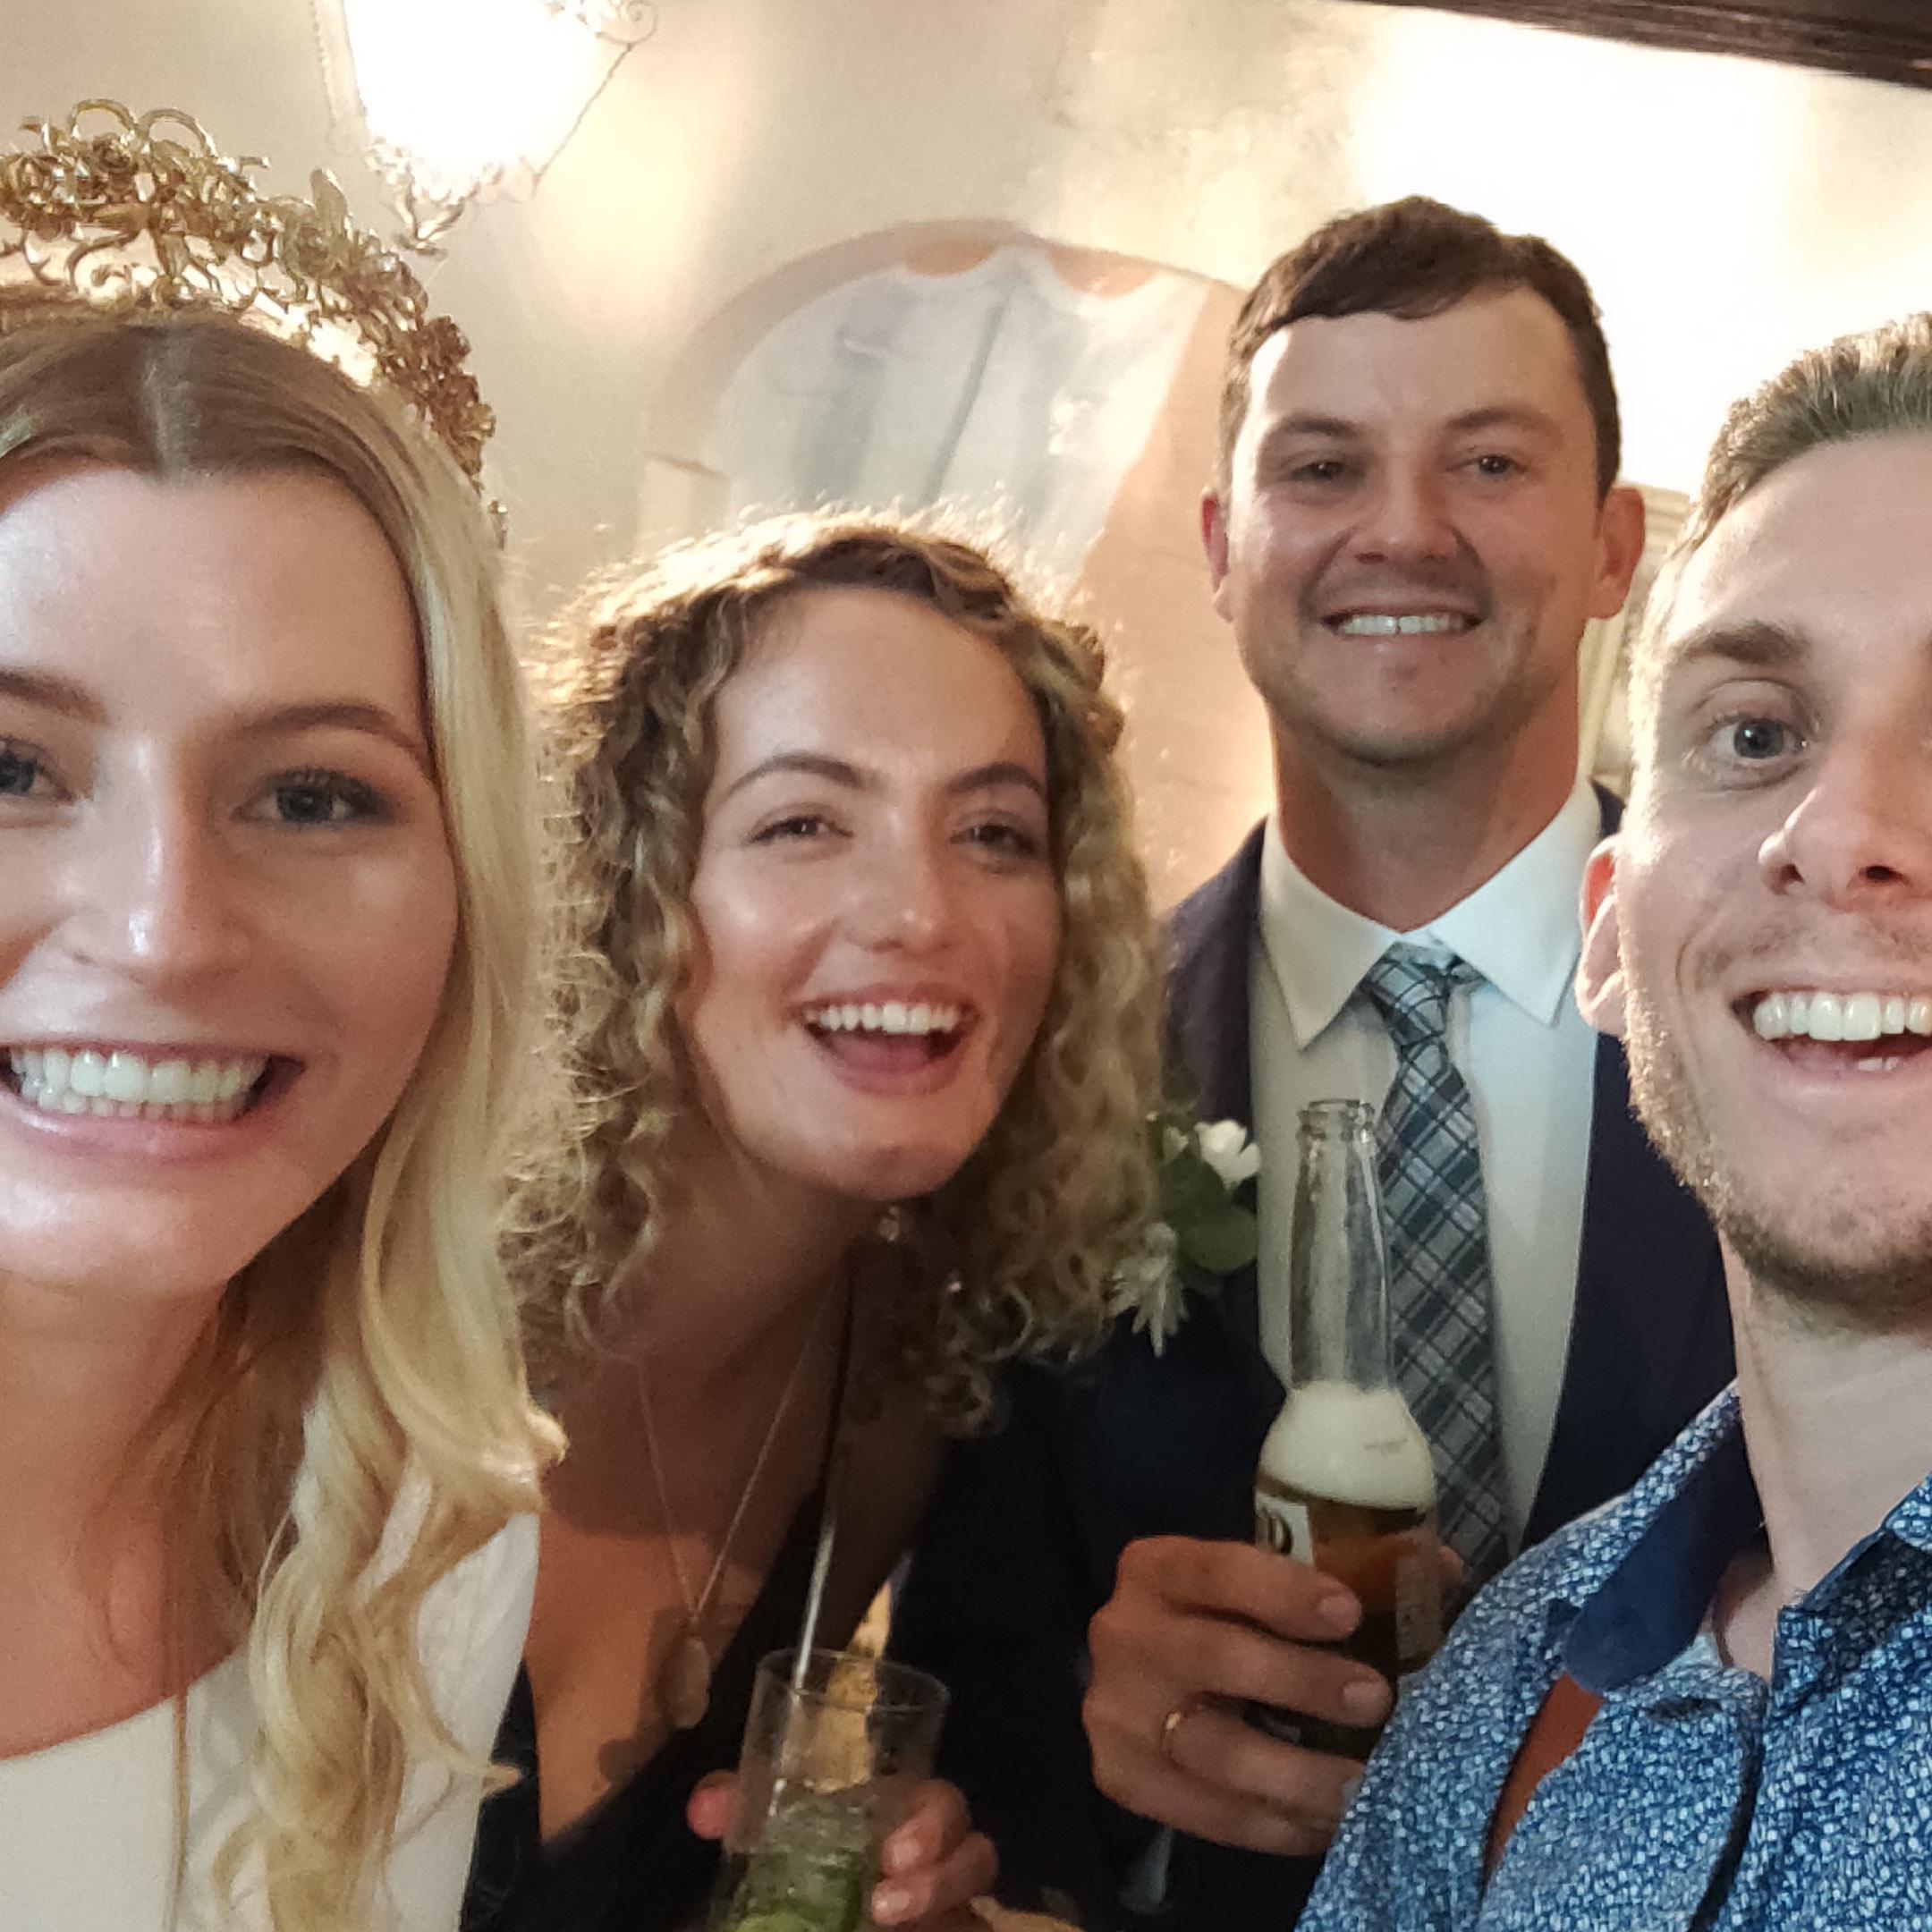 The-raw-photographer-cairns-wedding-photography-bridalparty-selfie-8.jpg